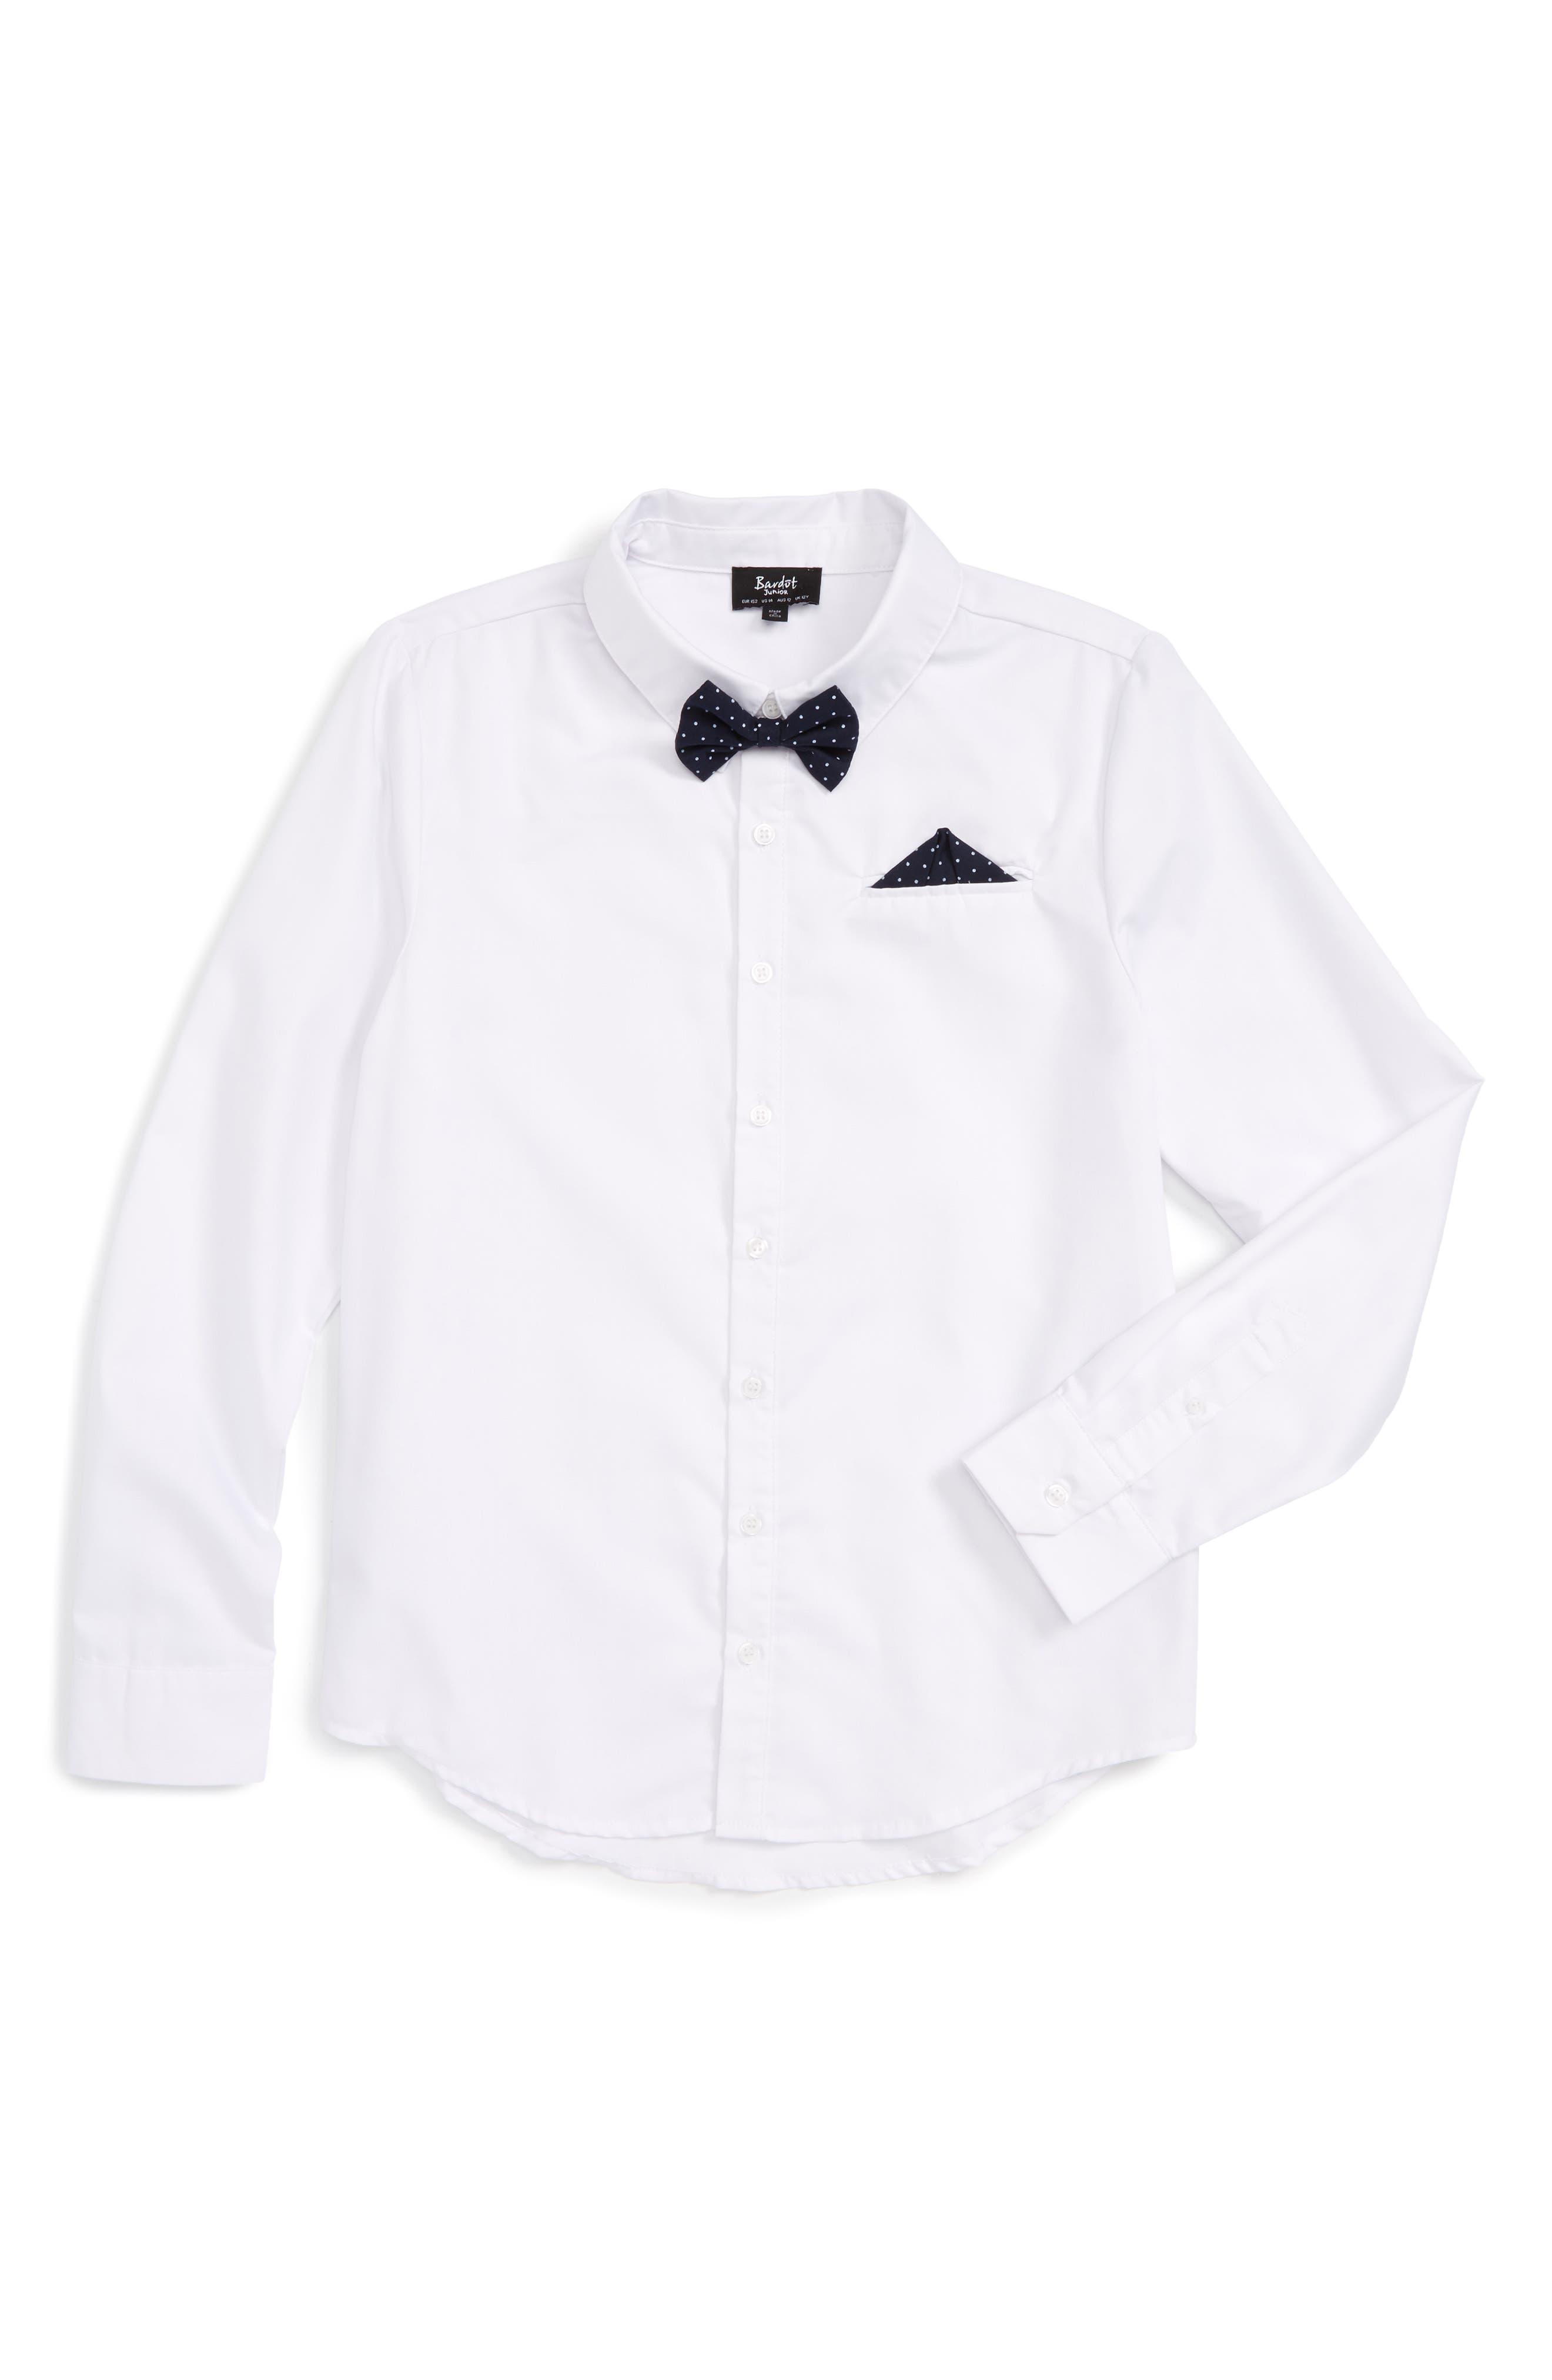 Main Image - Bardot Junior Dapper Shirt (Toddler Boys, Little Boys & Big Boys)